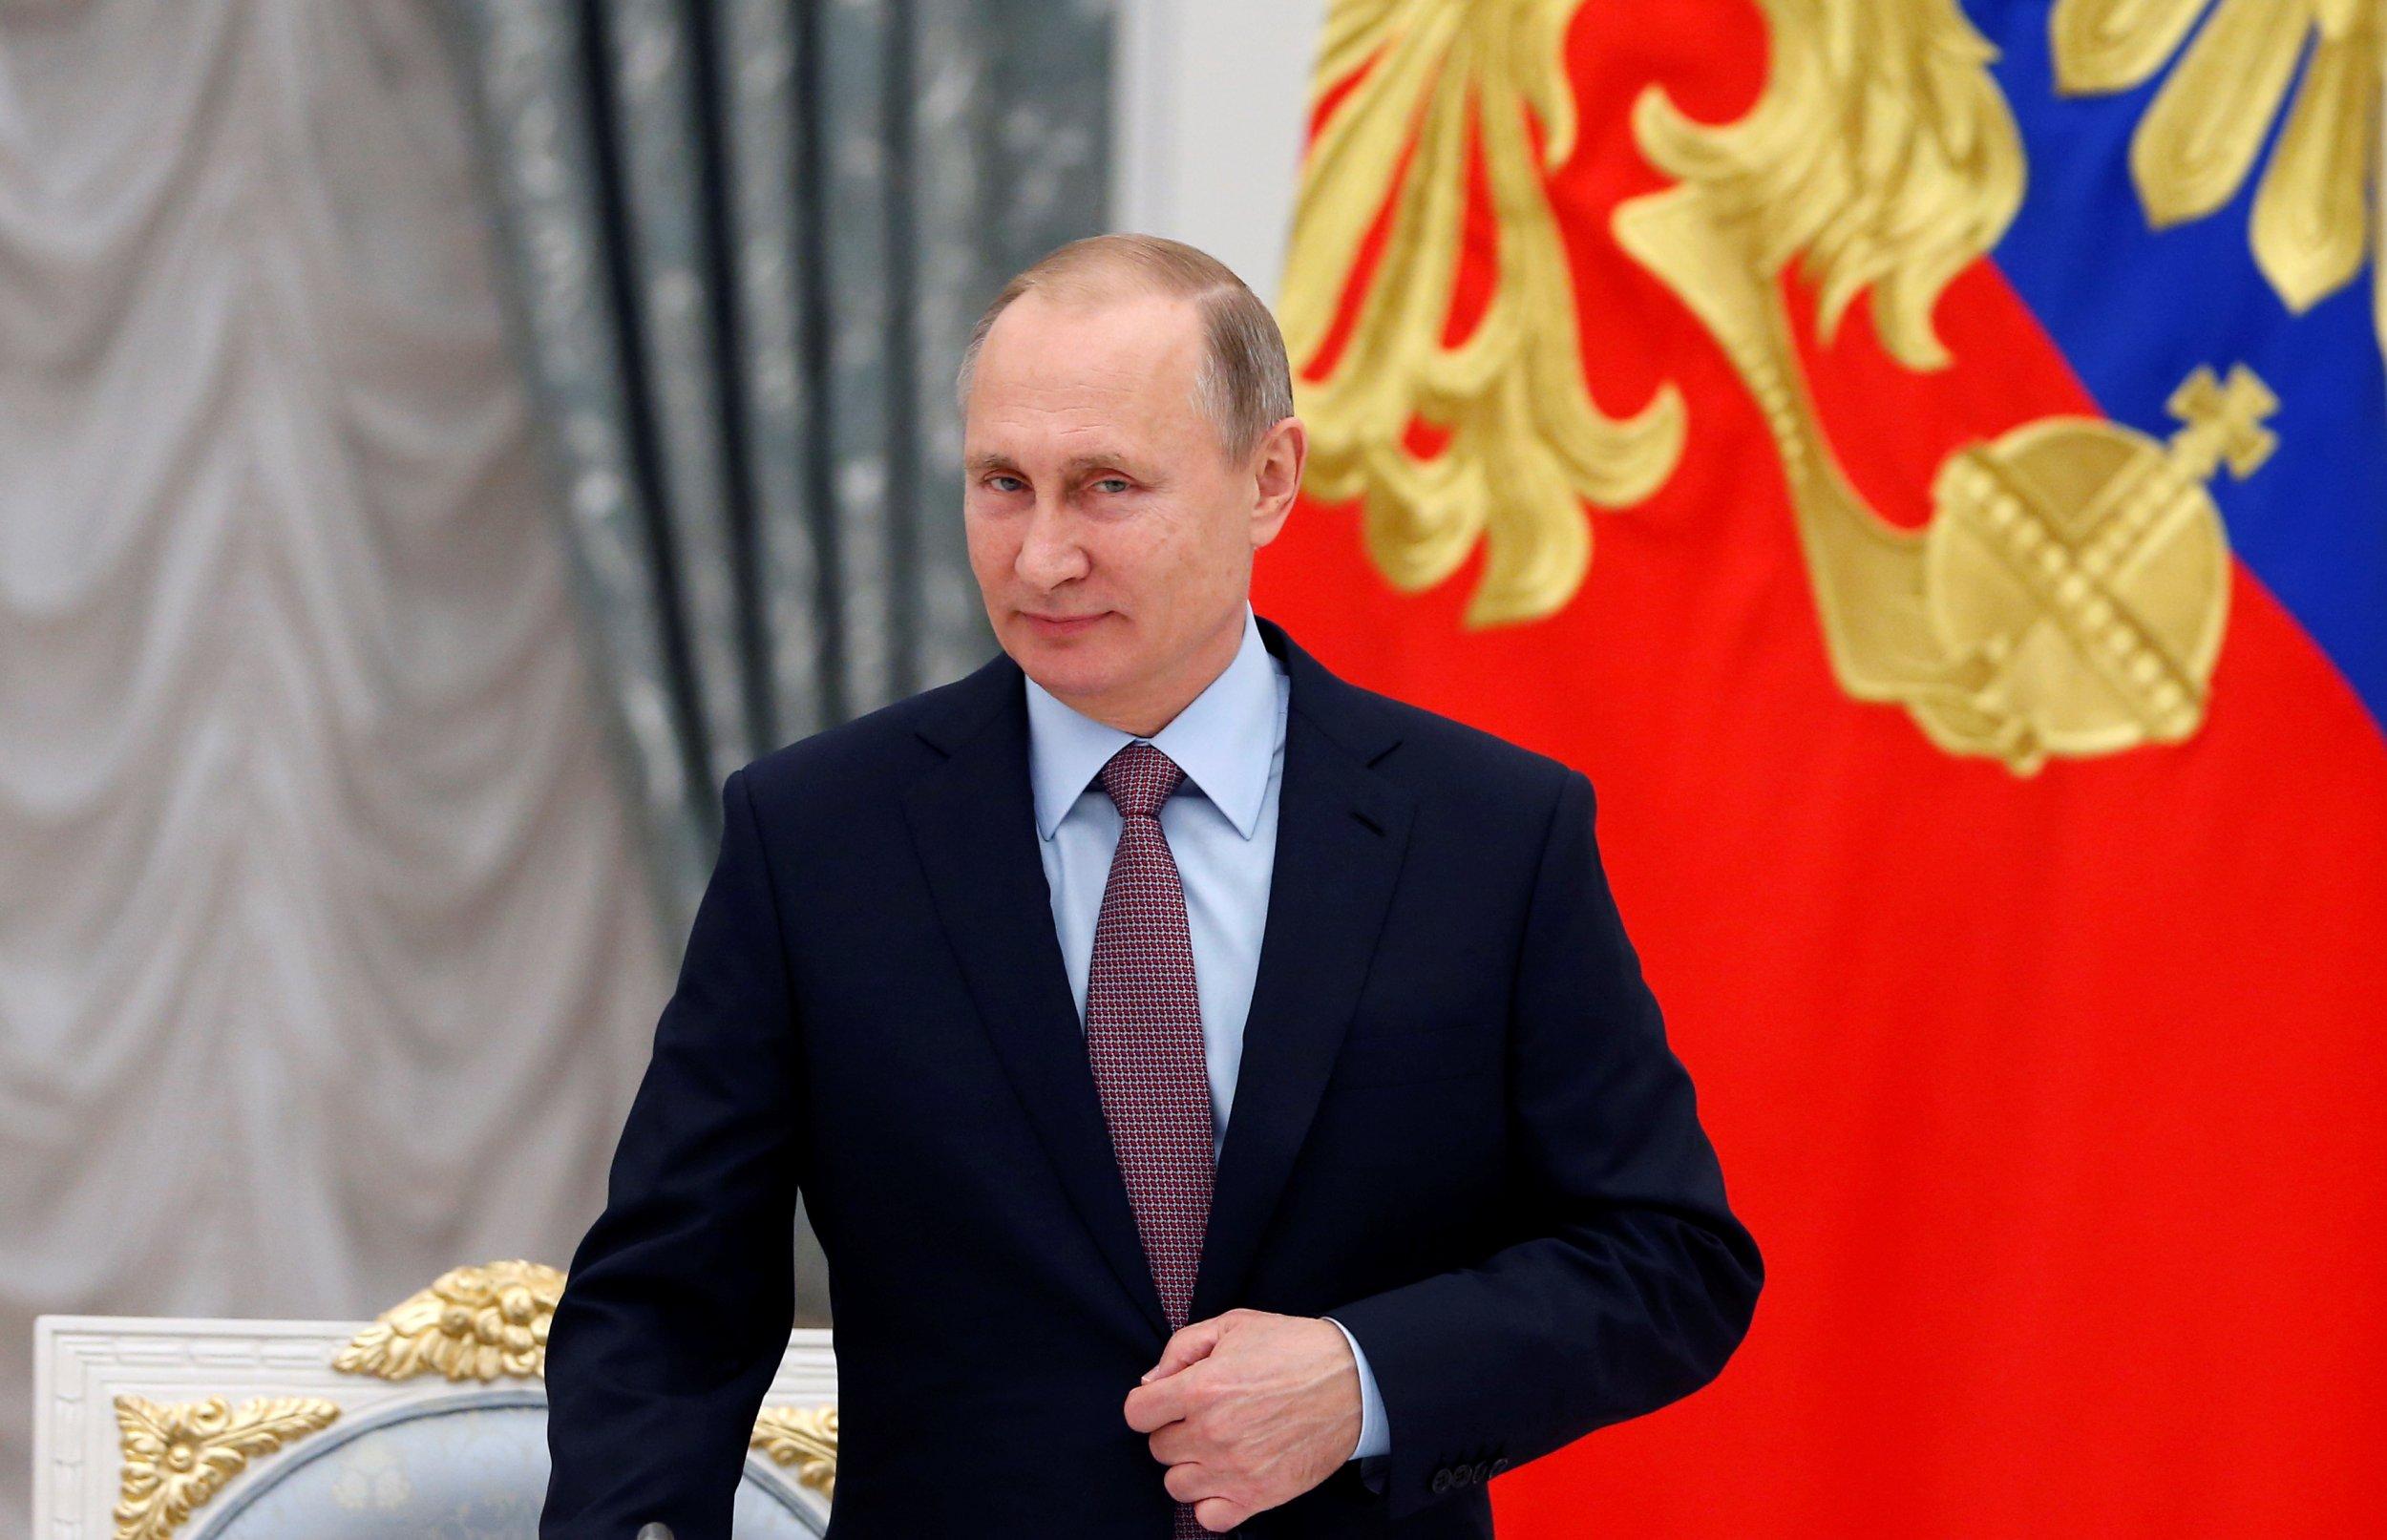 12_10_Putin_Sanctions_01